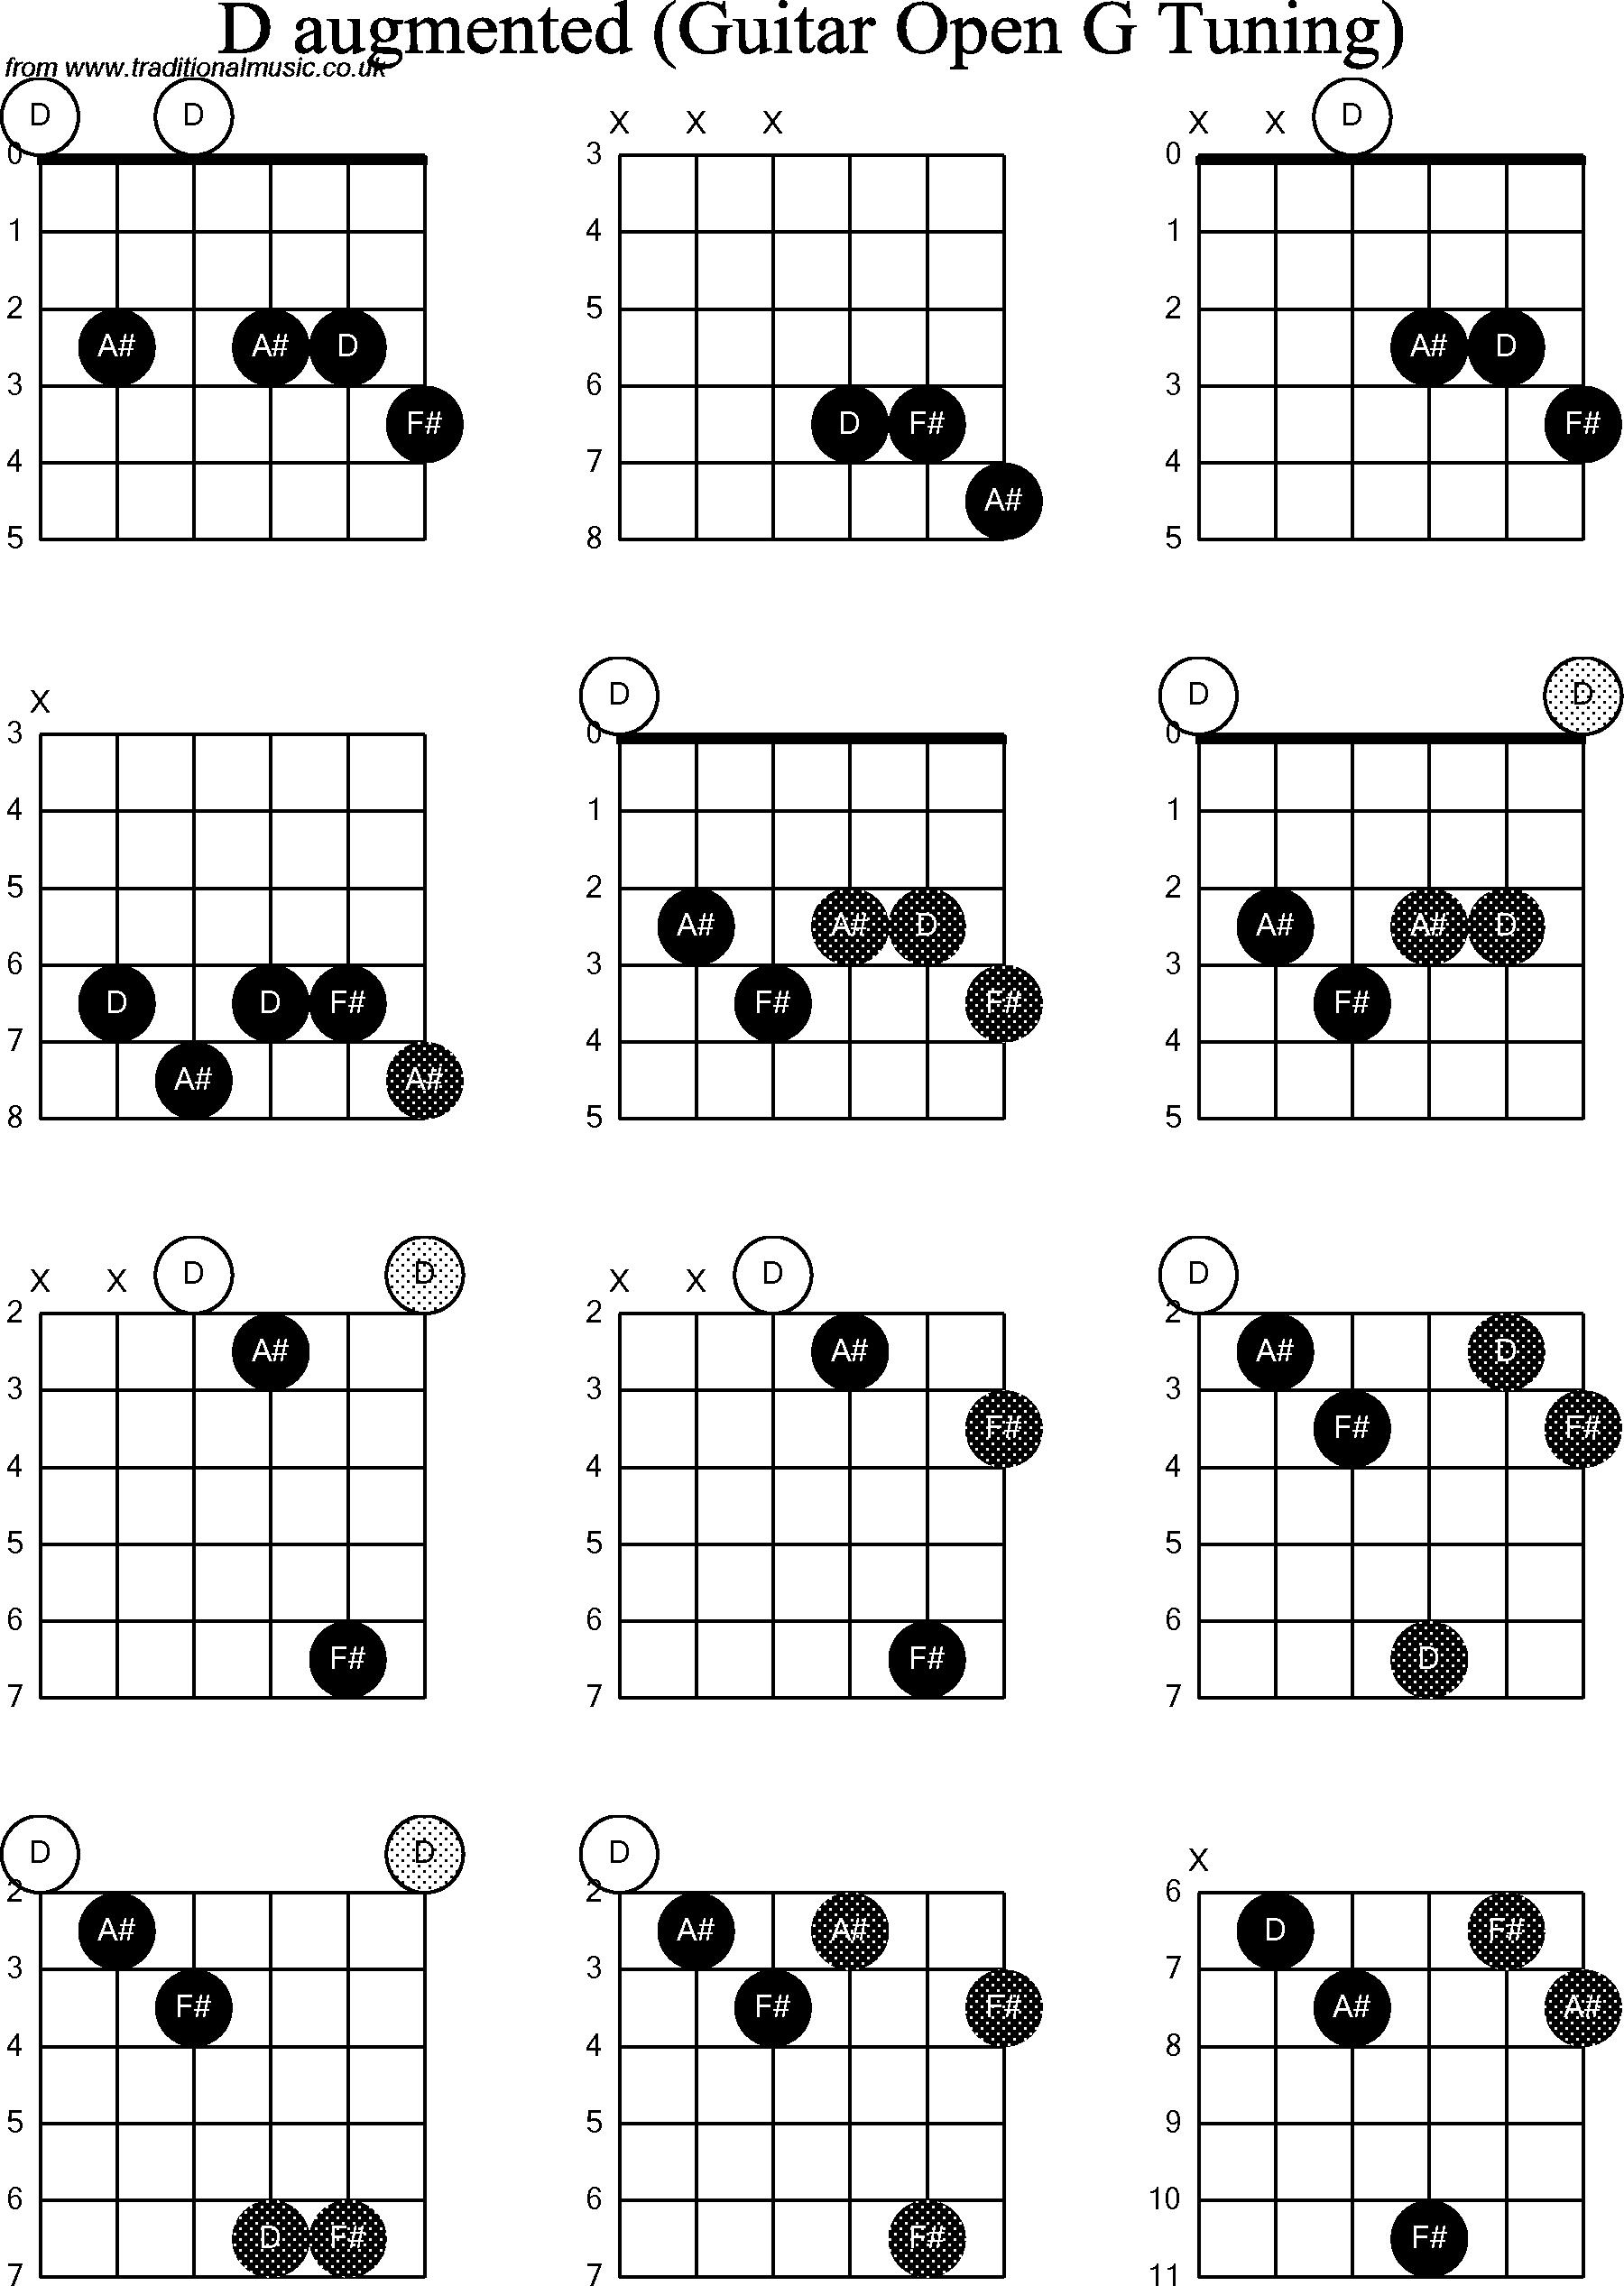 Chord diagrams for: Dobro D Augmented